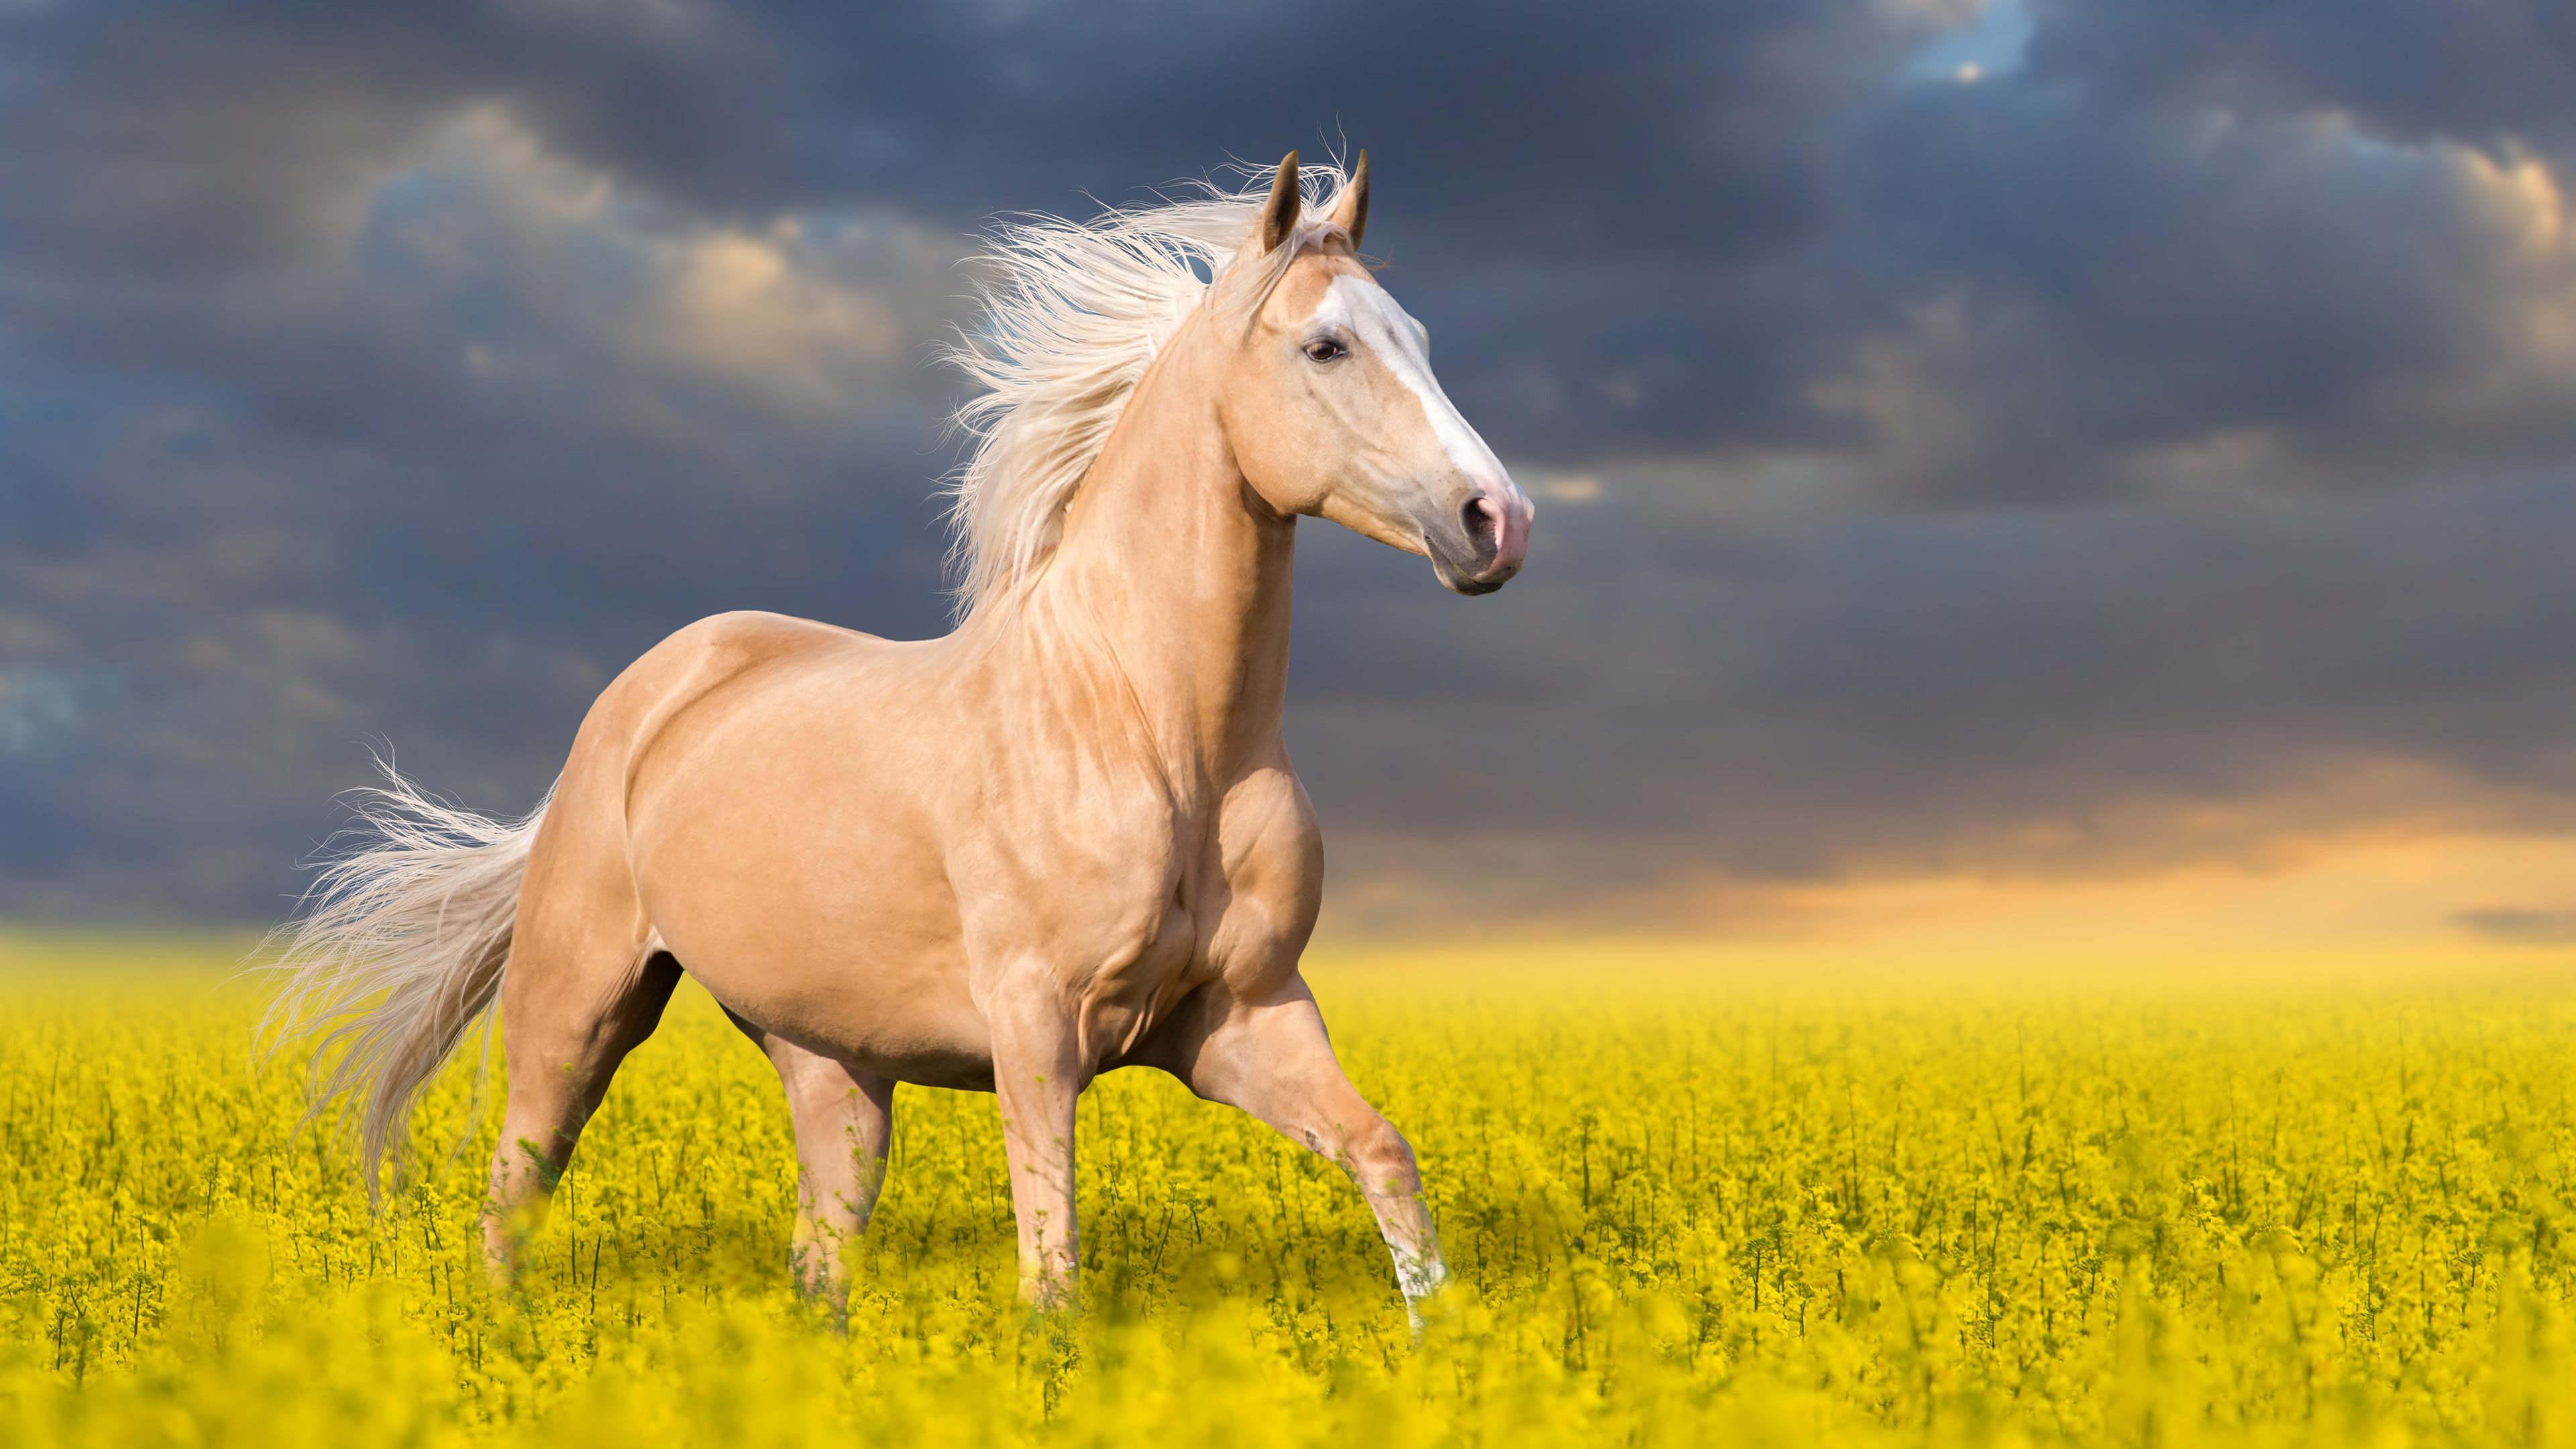 palomino horse uhd 4k wallpaper